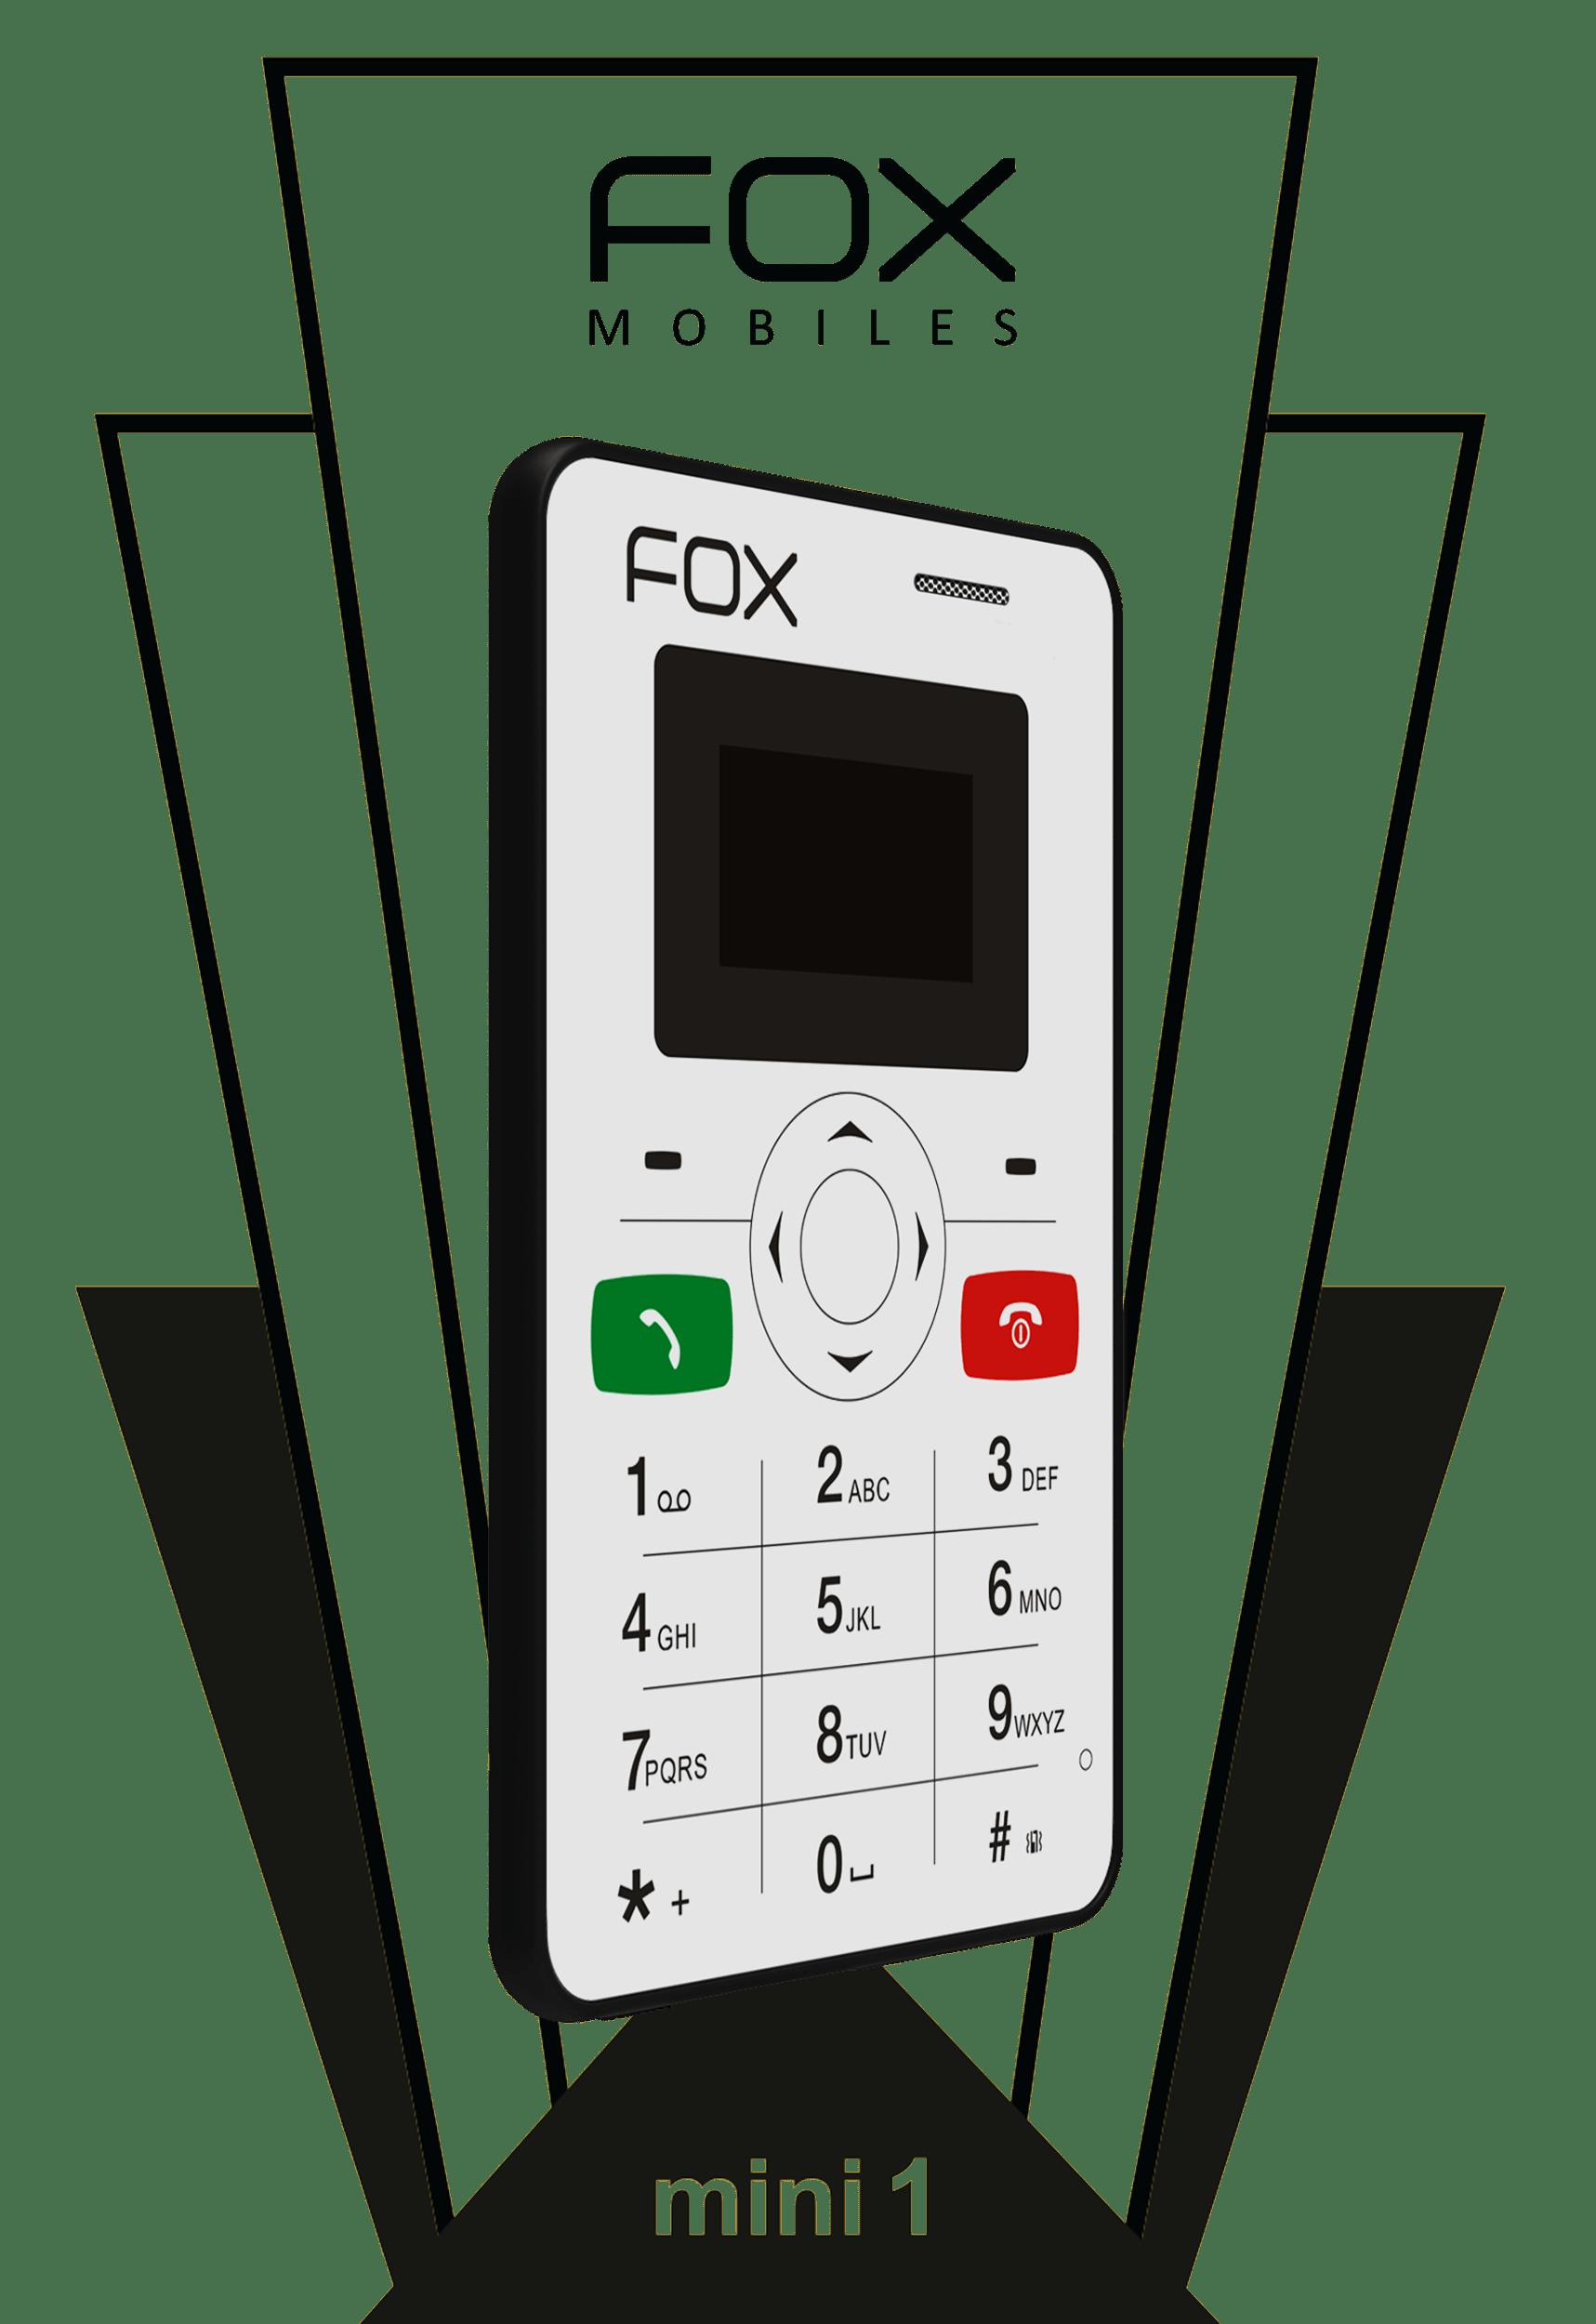 Telephone clipart phone handle. Mini fox mobiles handset